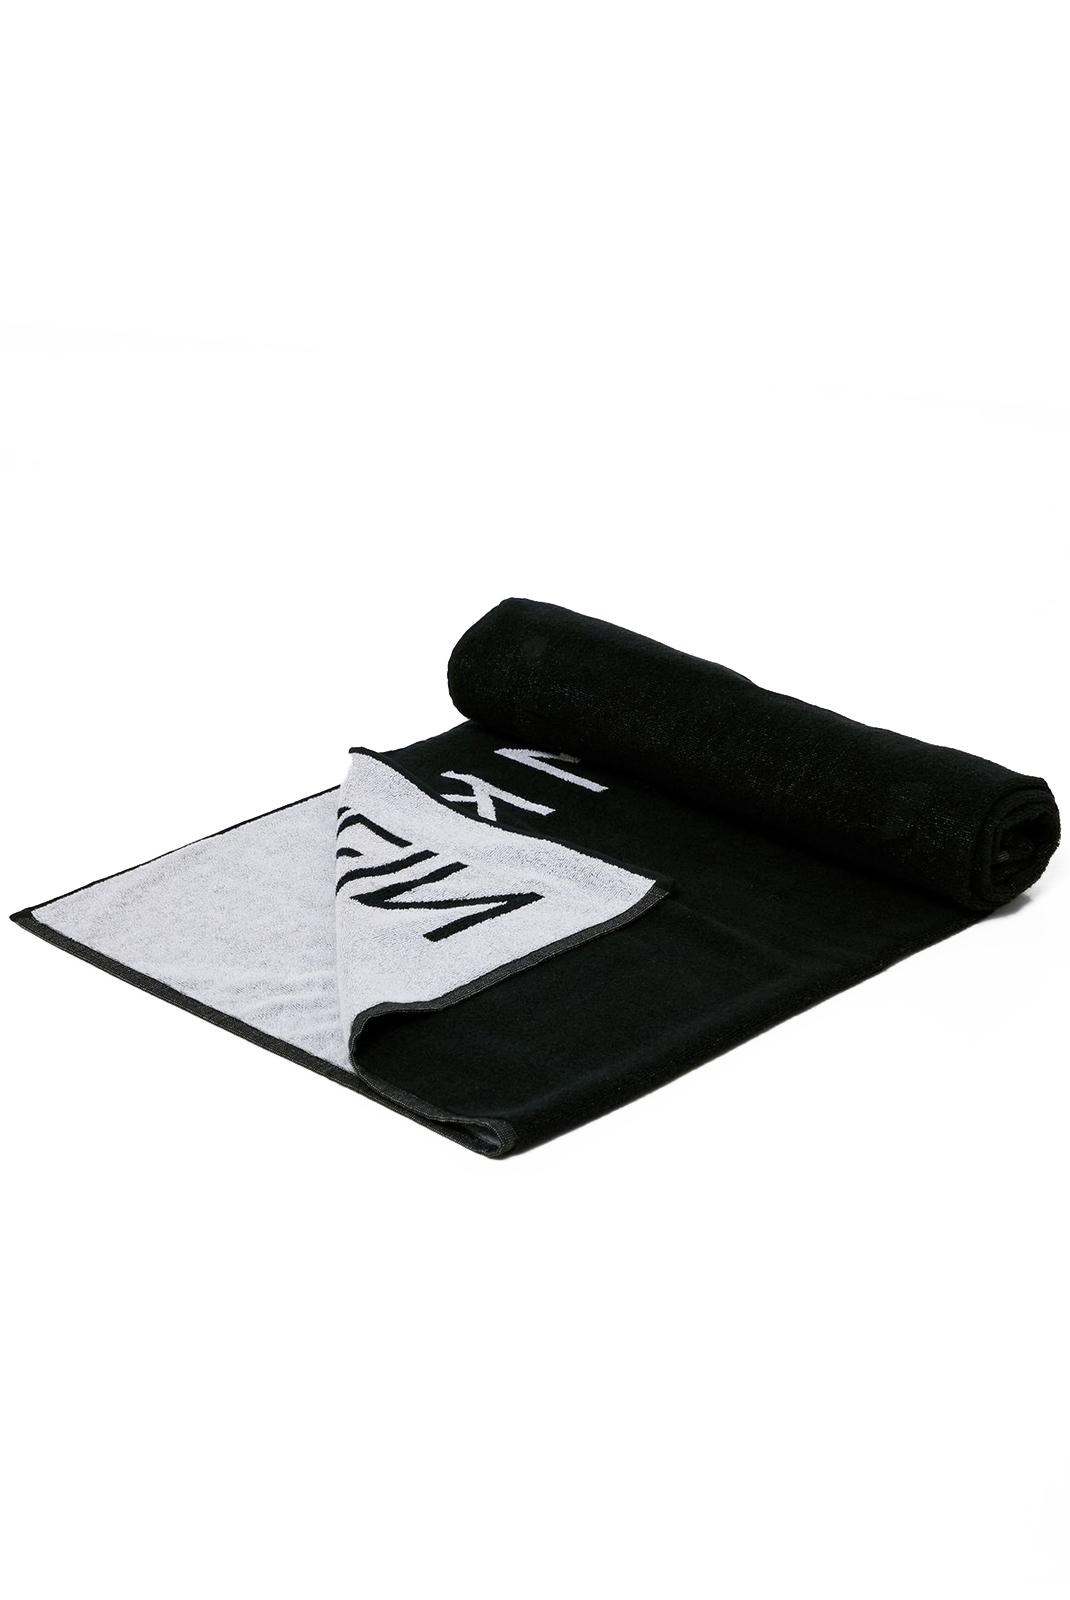 Maillots & Sous-vêtements  Calvin klein KU0KU00025-BEH PVH Black